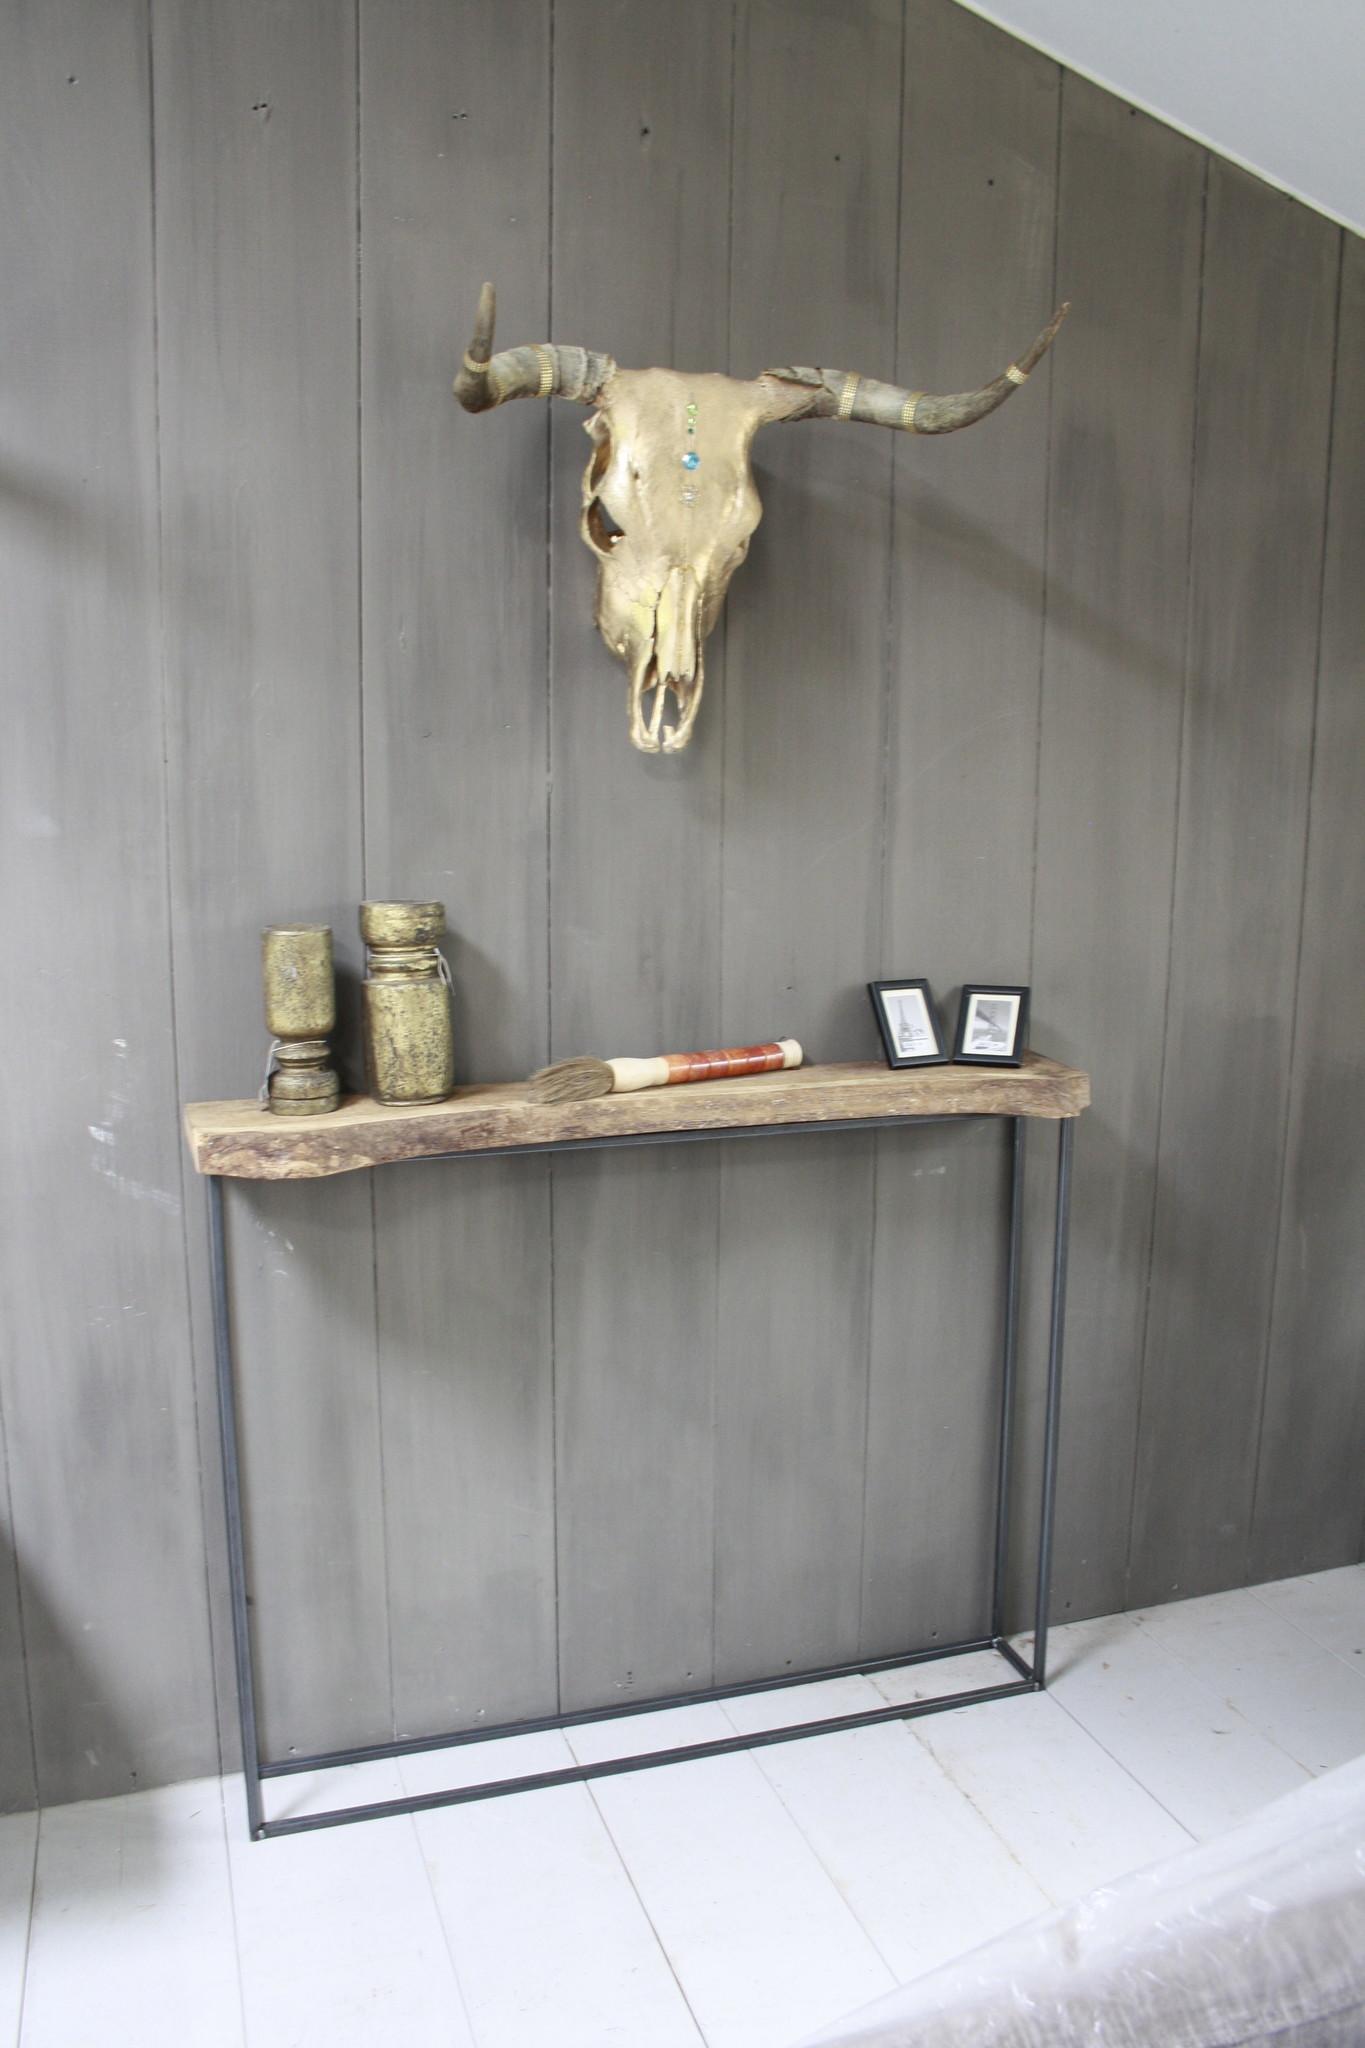 Longhorn Schedel Goud Met Hoorns 63 x 44 cm - Copy-7